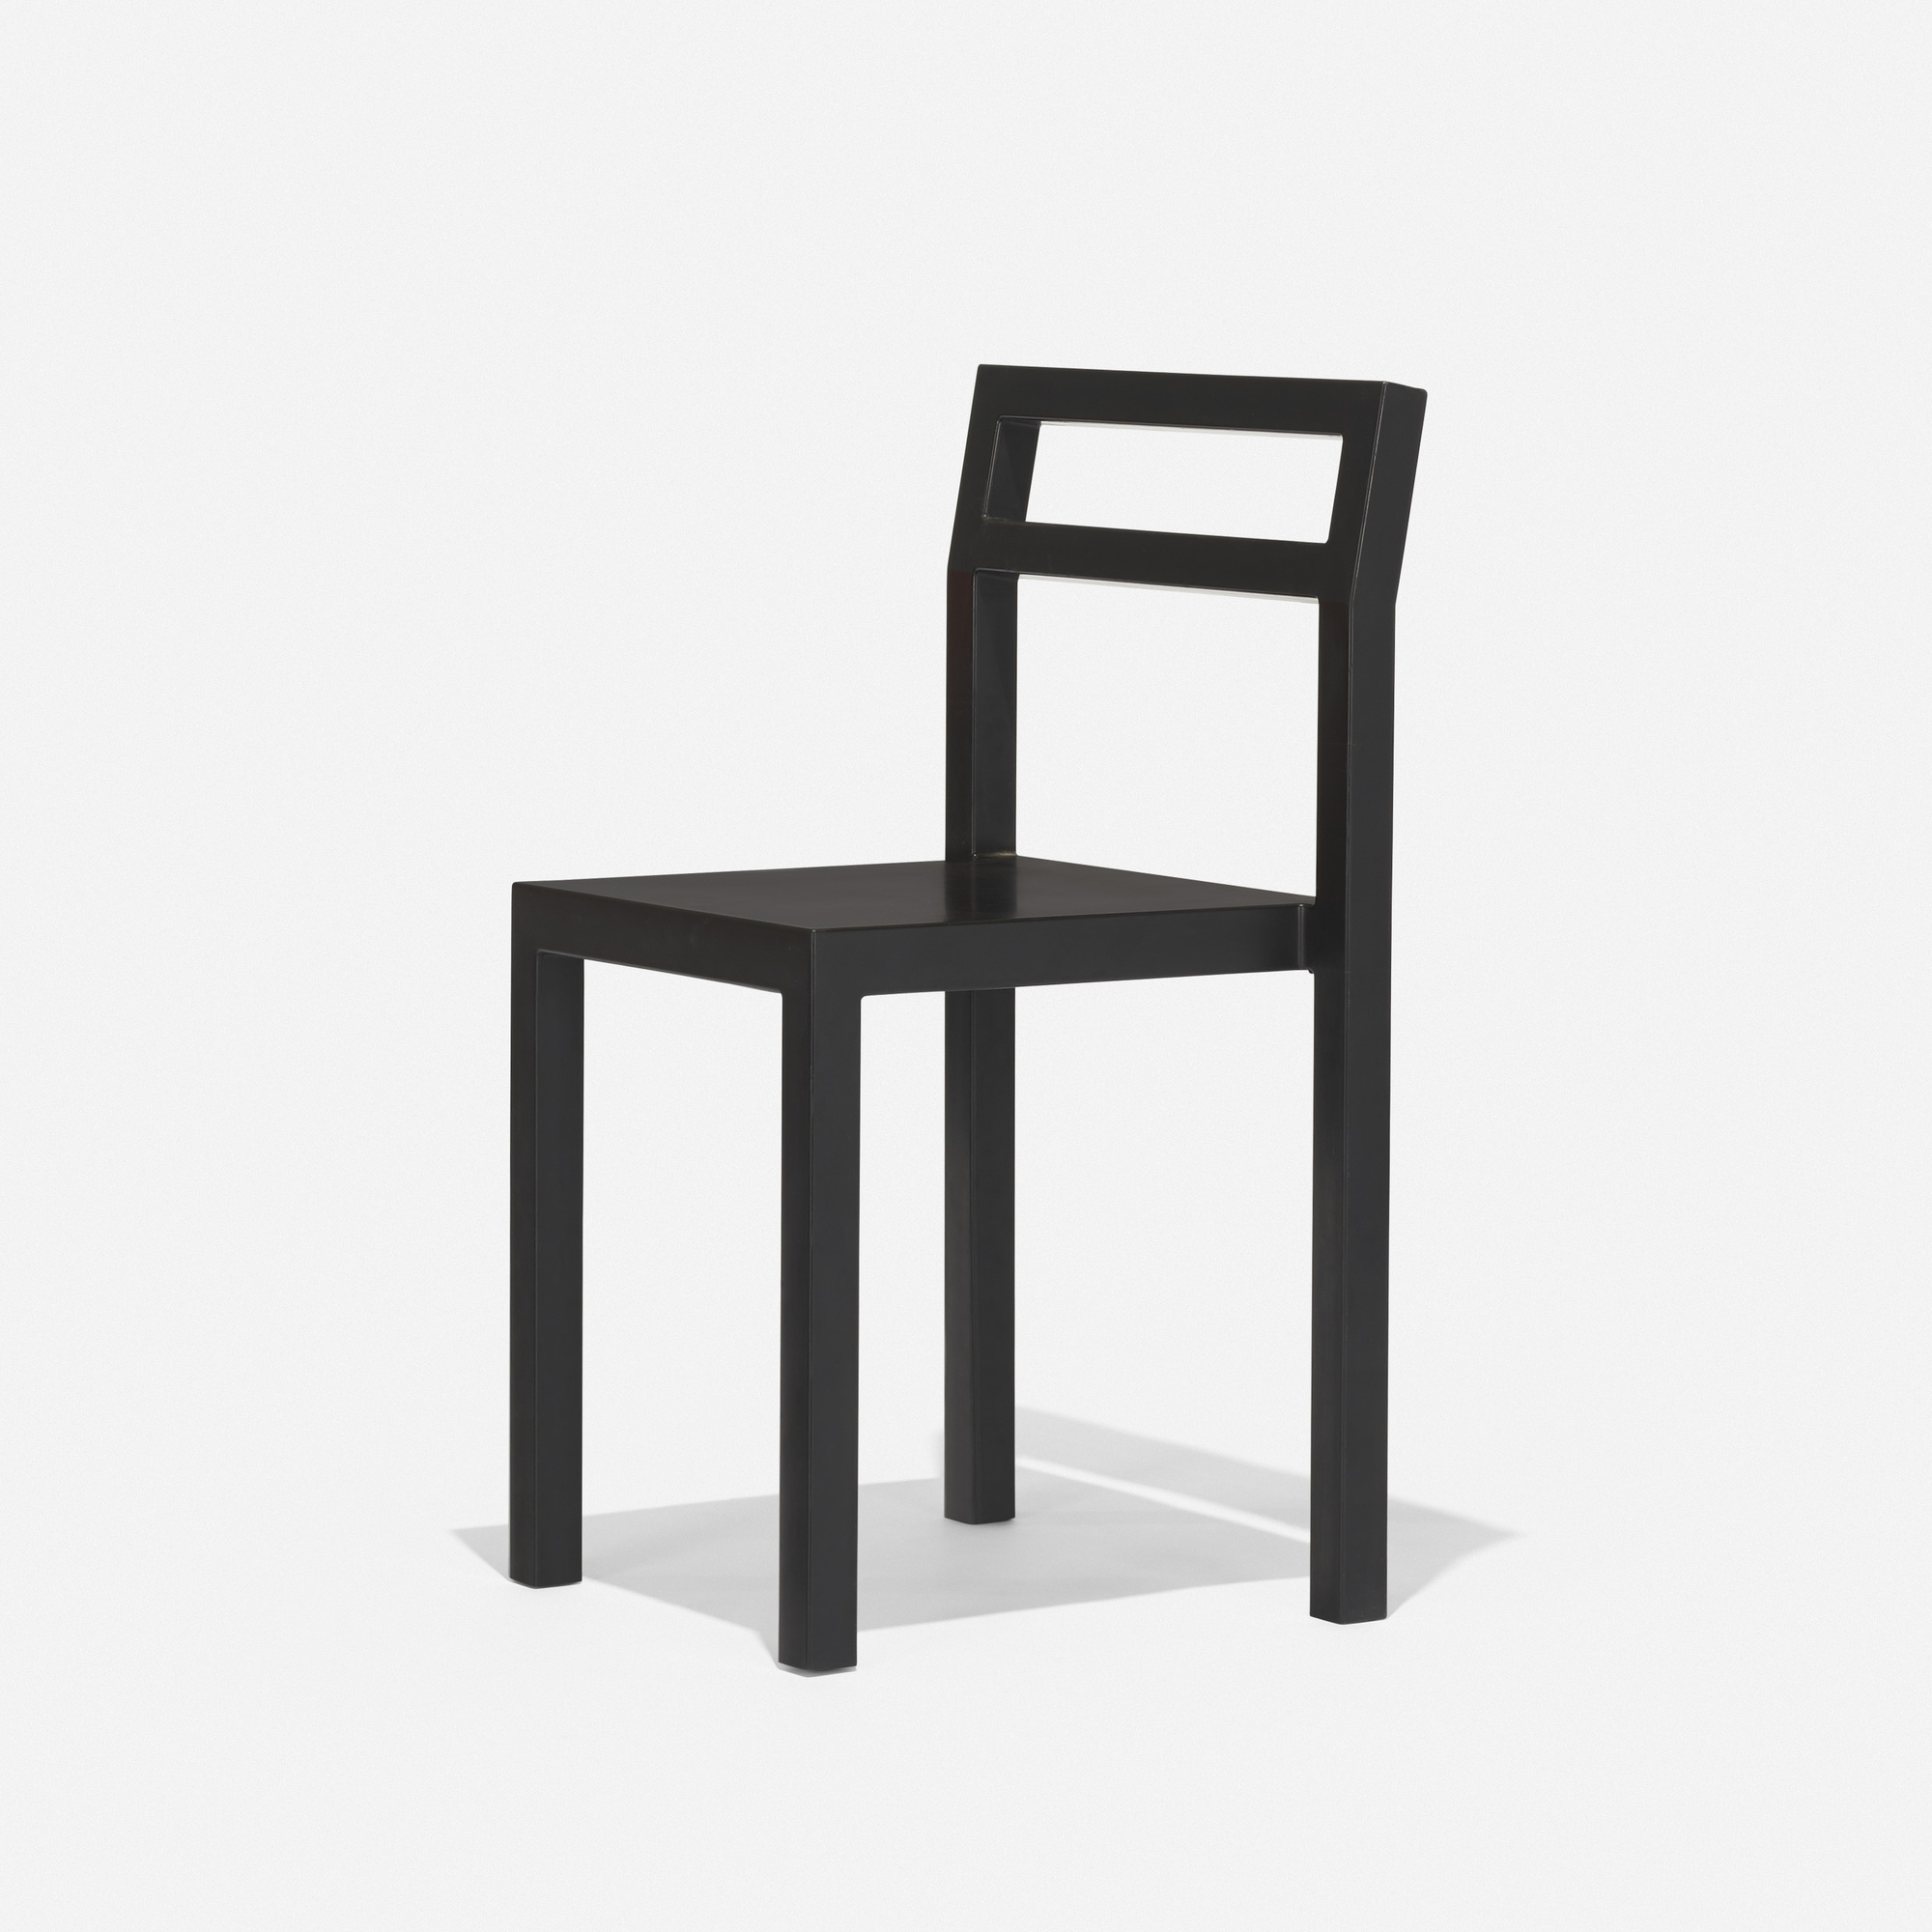 424: Komplot Design (Poul Christiansen and Boris Berlin) / Non Chair (1 of 3)